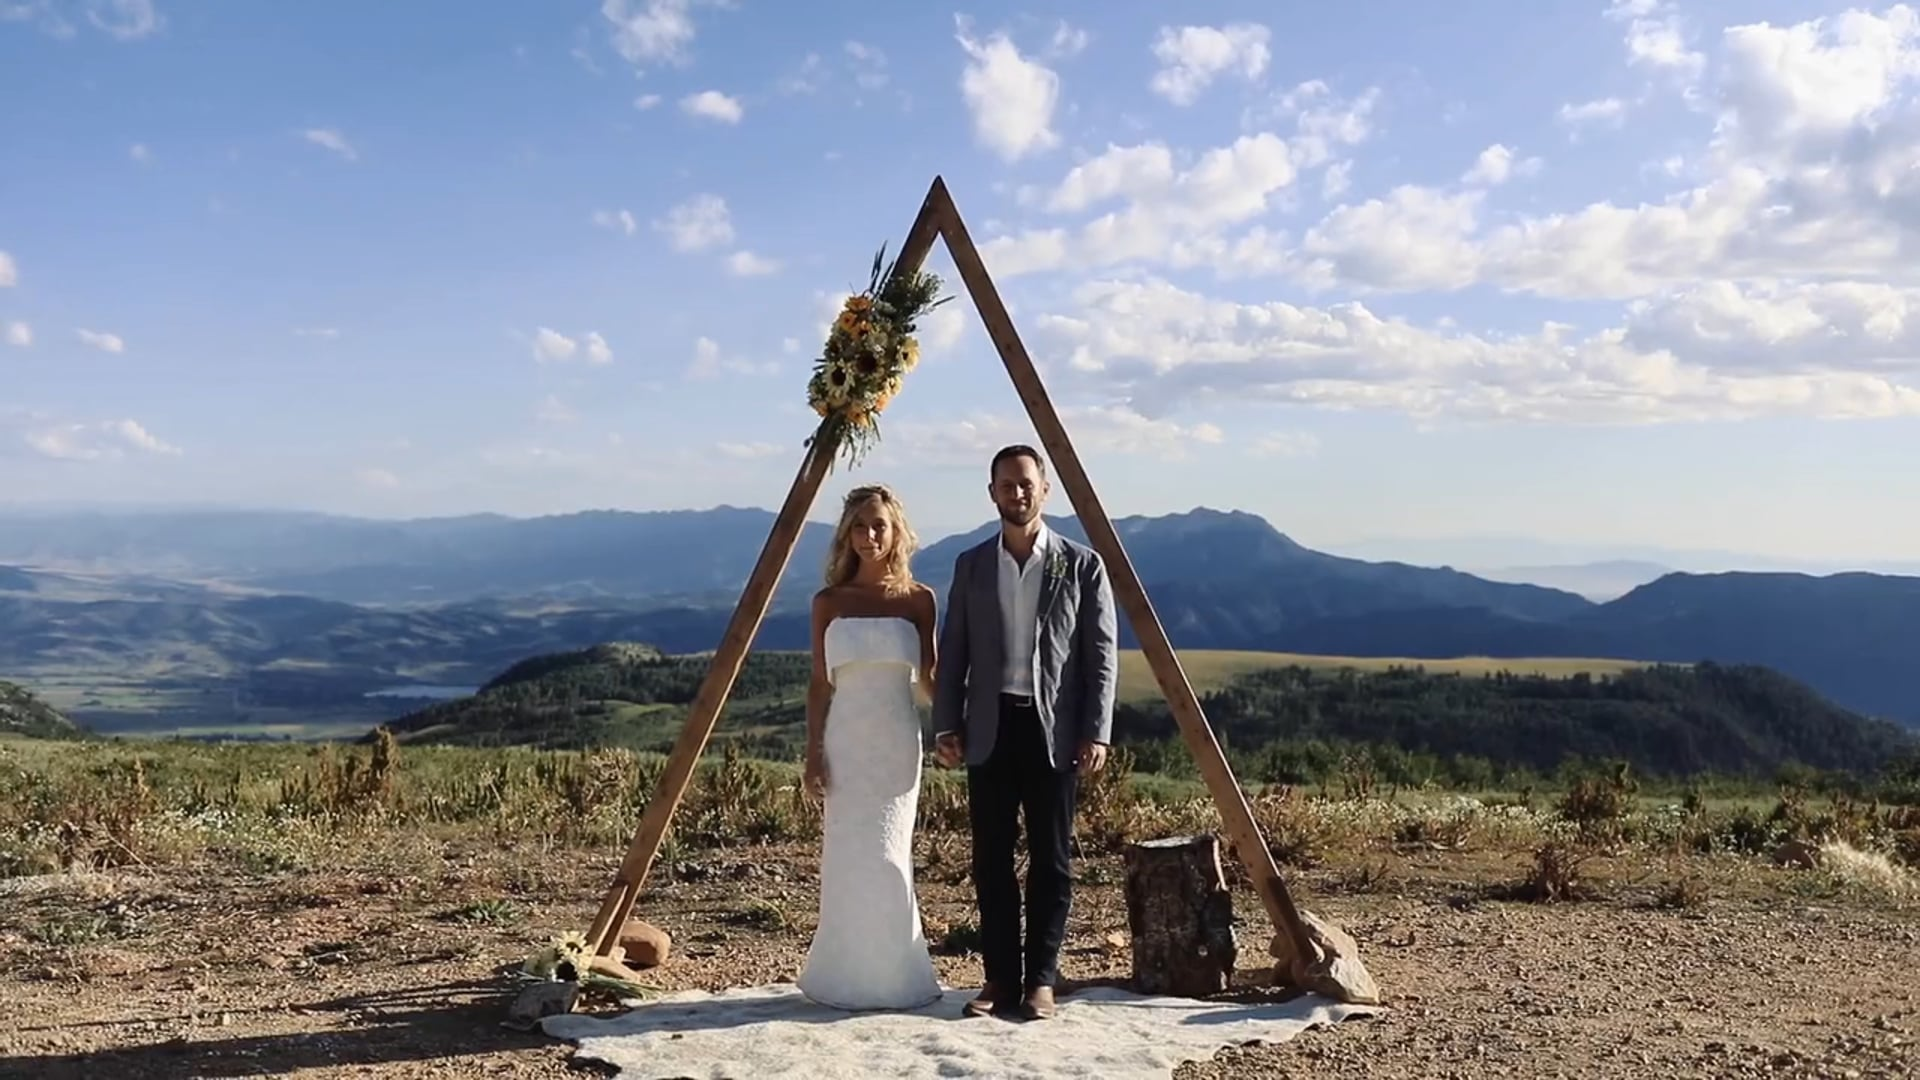 The Wedding of Hanna & Matt // Skylodge, UT